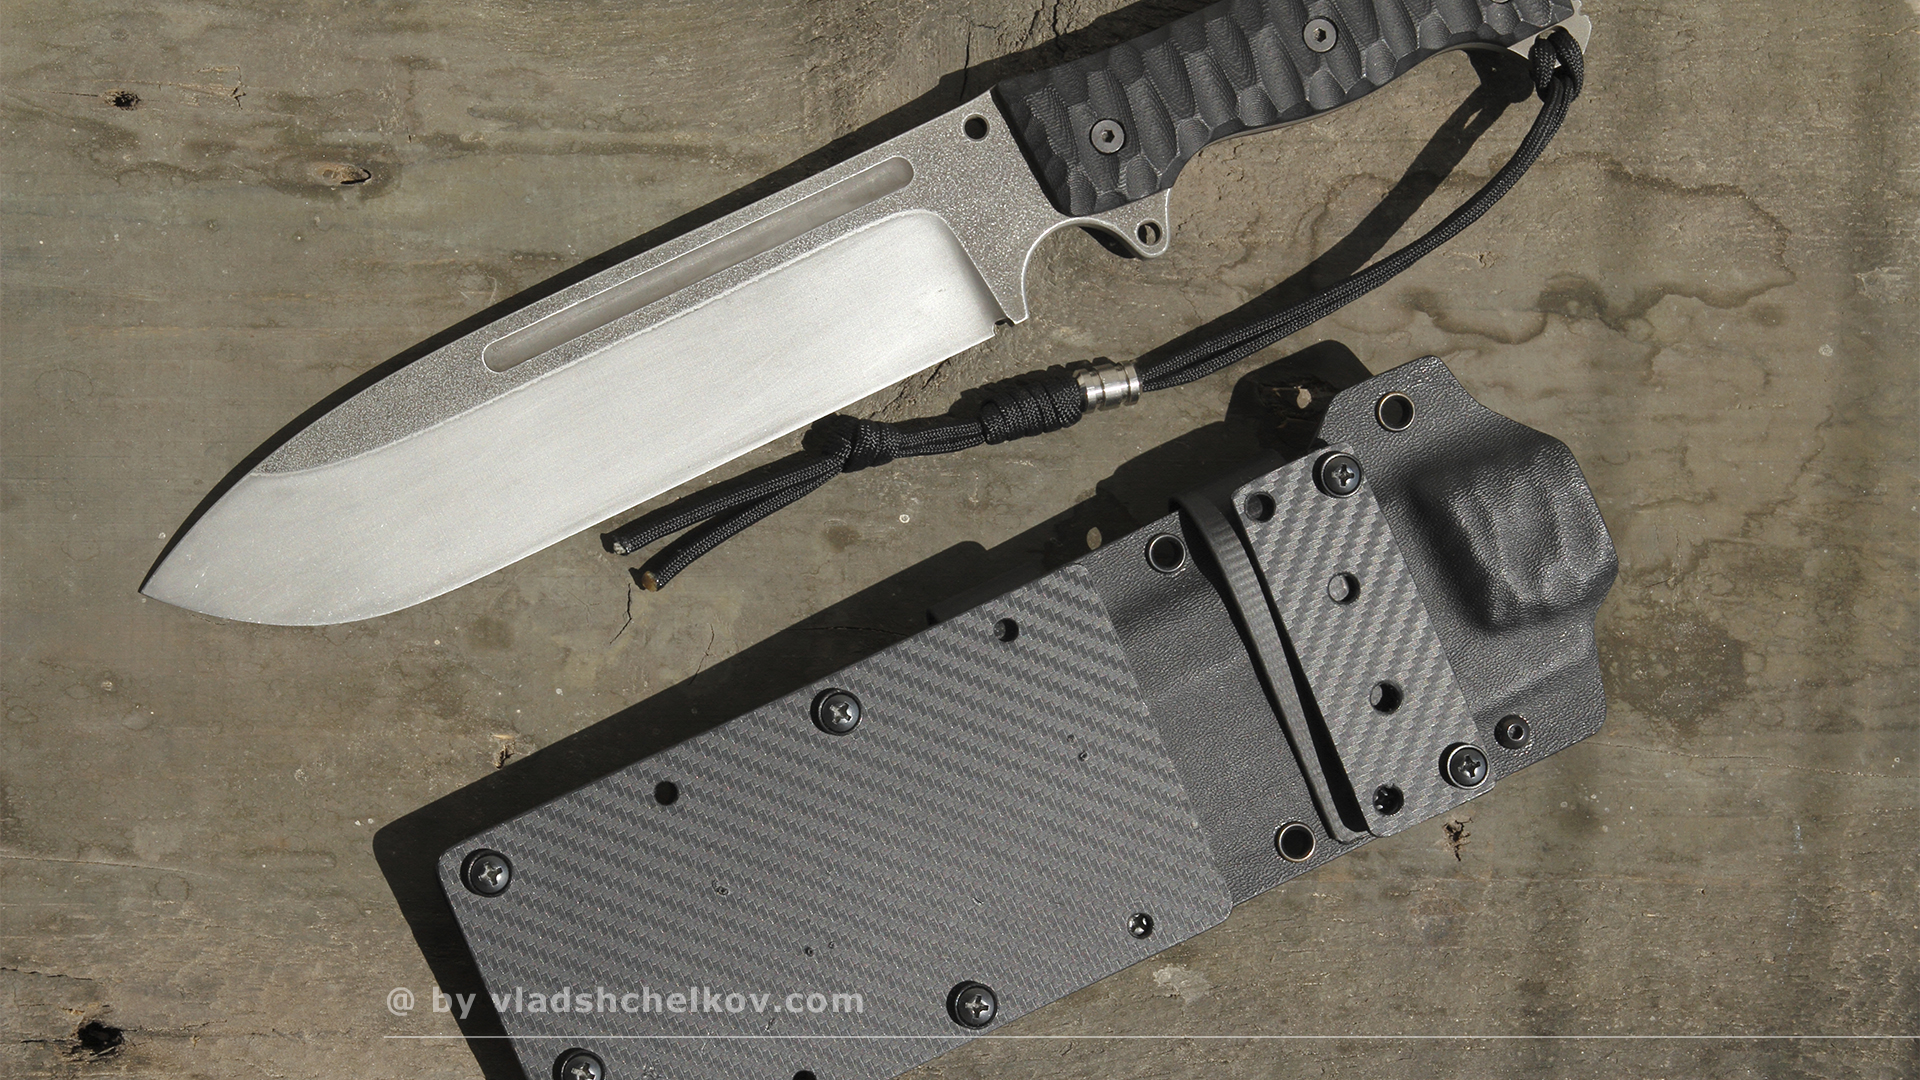 BÖHLER M390 Knife with kydex sheaths